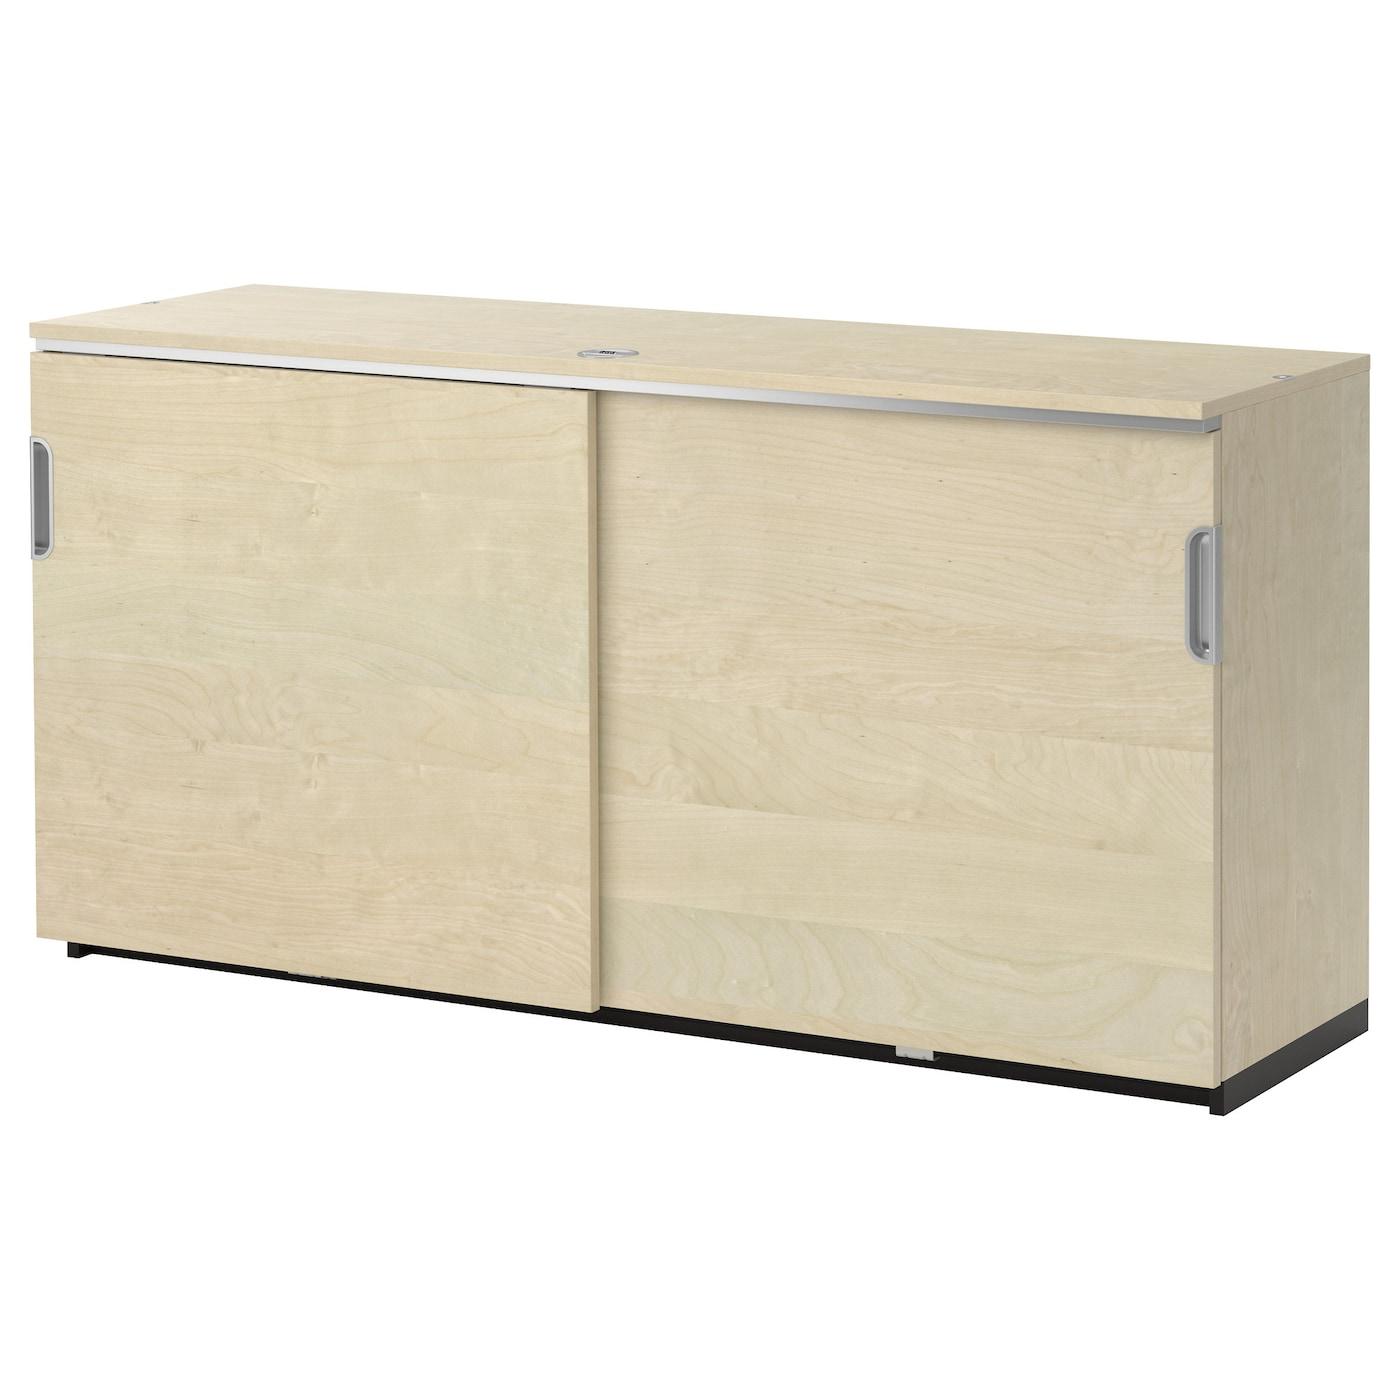 Armoire bureau et classeur de dossier ikea for Ikea effektiv classeur